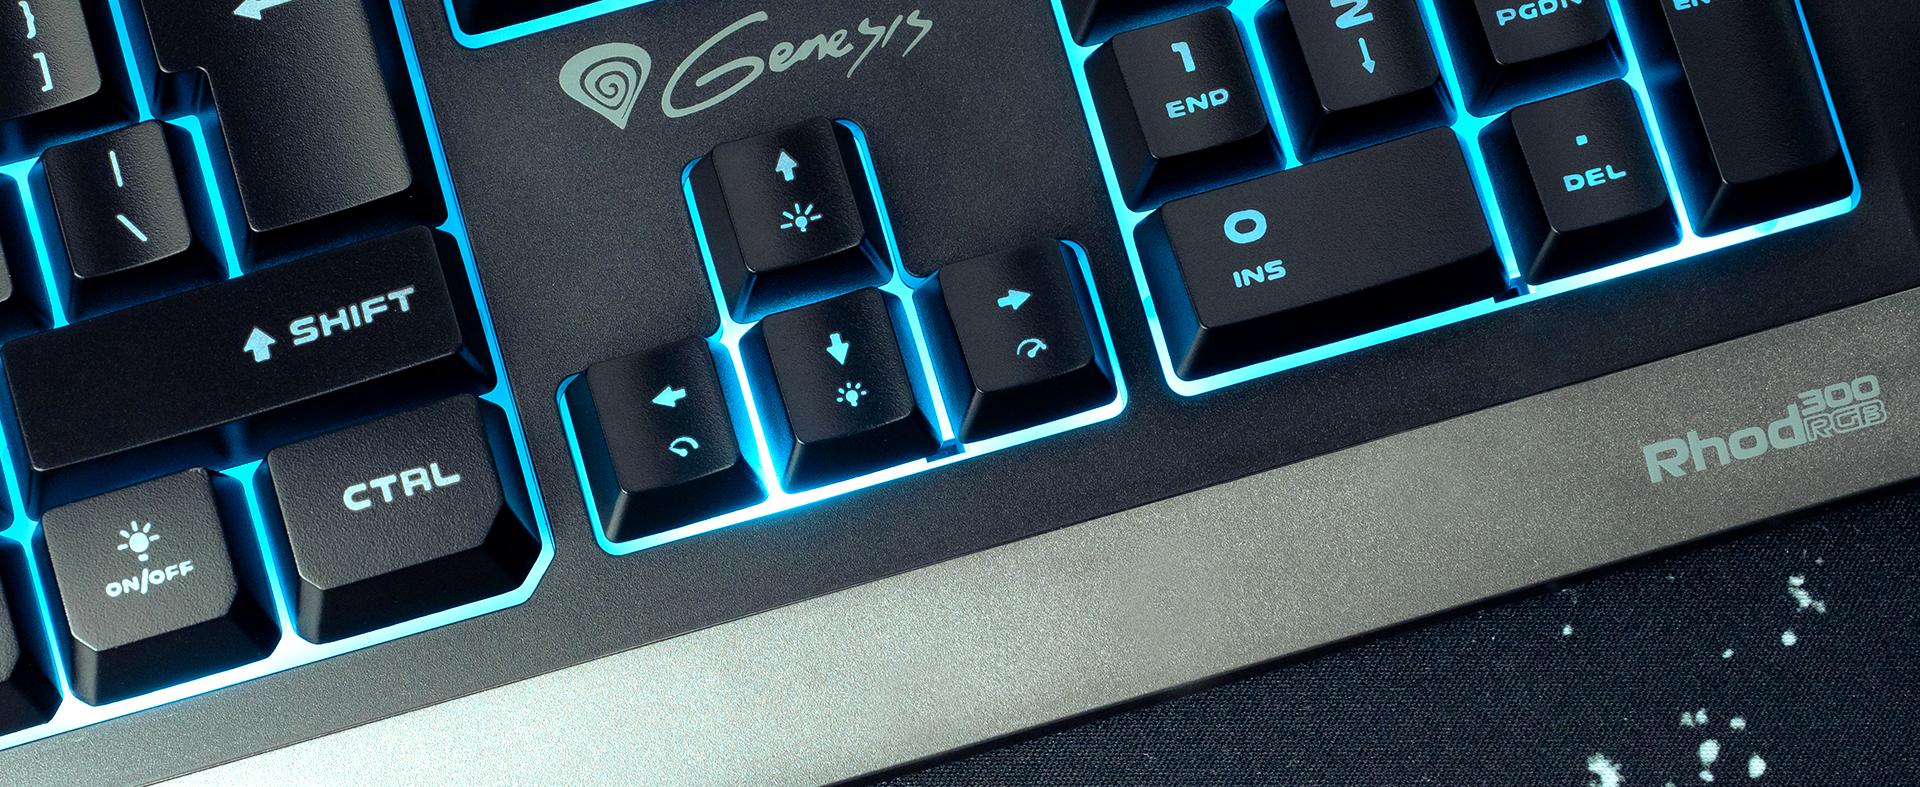 backlit gaming keyboard genesis rhod 300 us layout 4